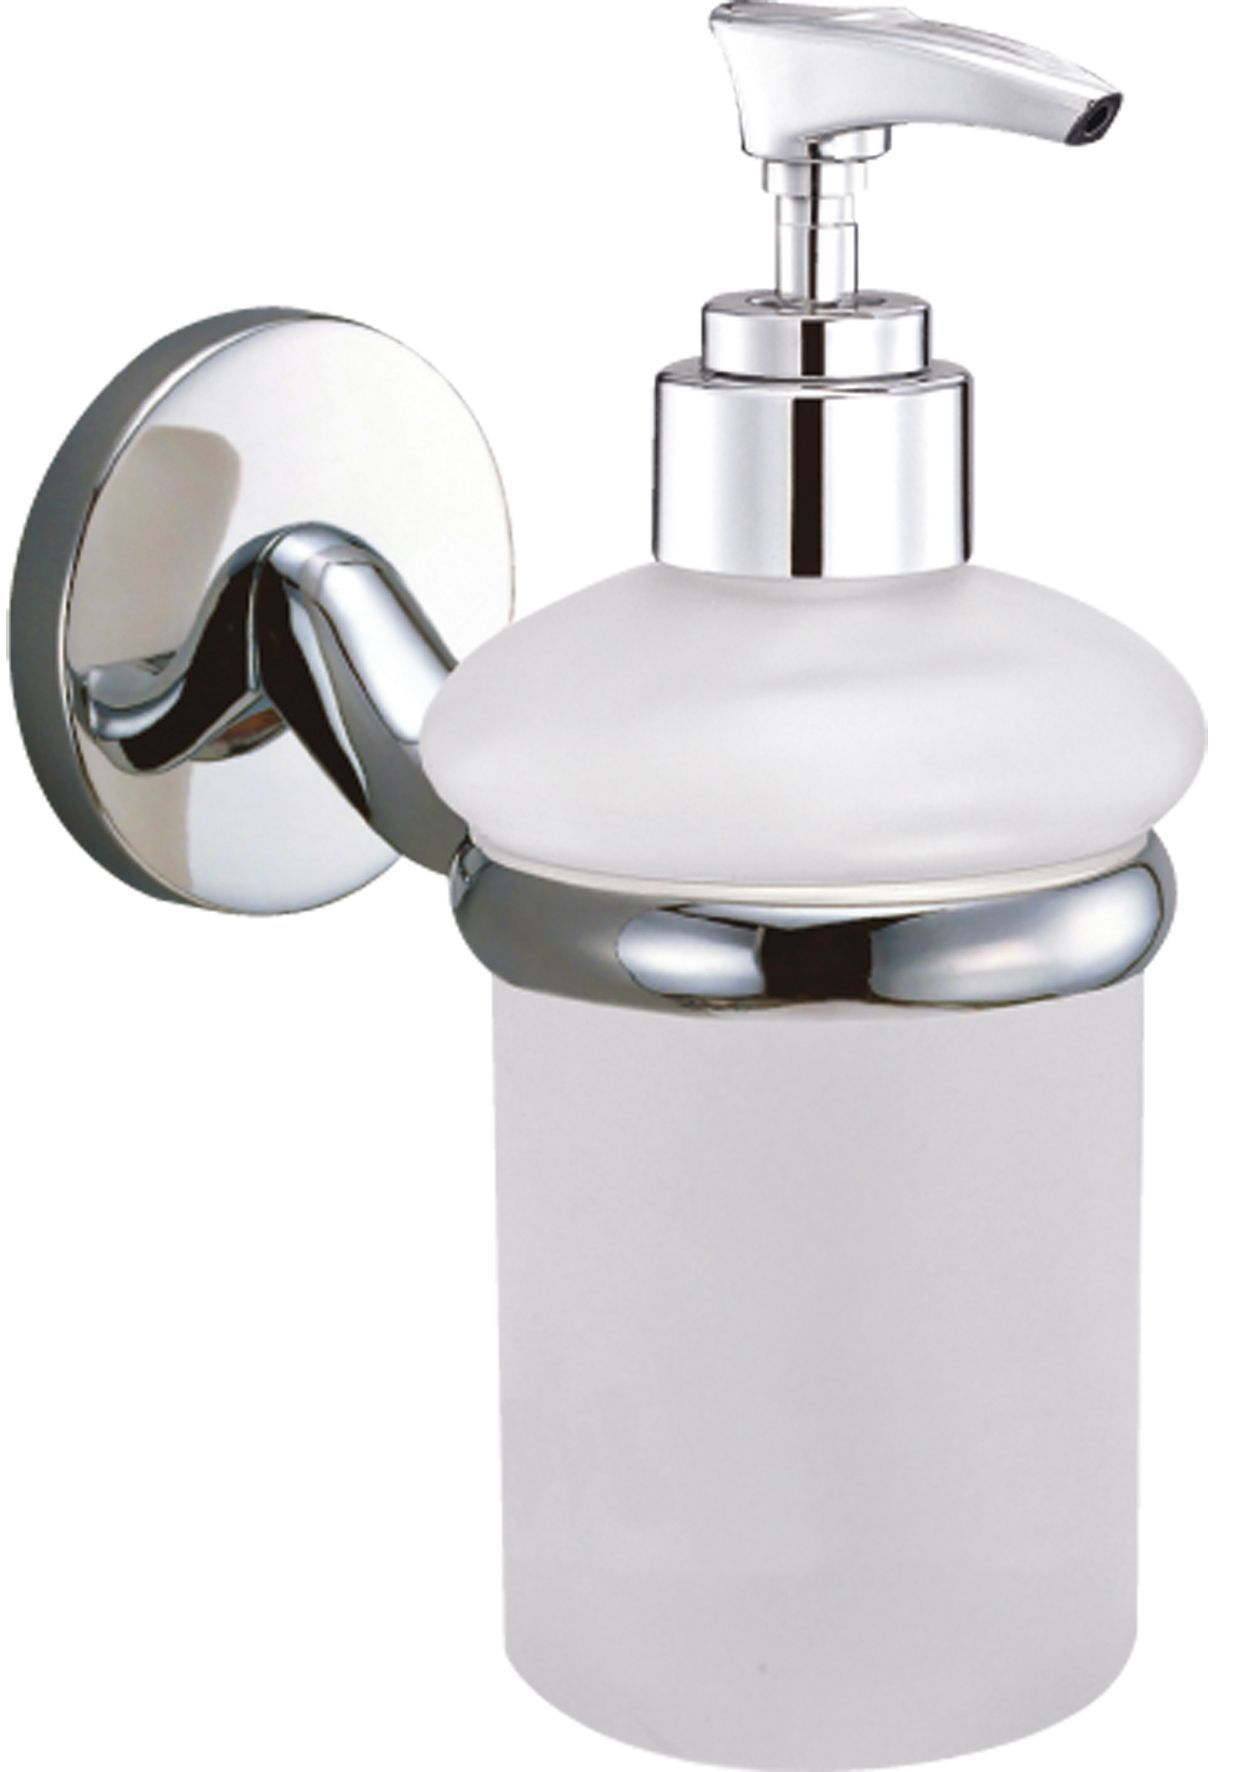 B&q Curve White Chrome Effect Wall Mounted Soap Dispenser